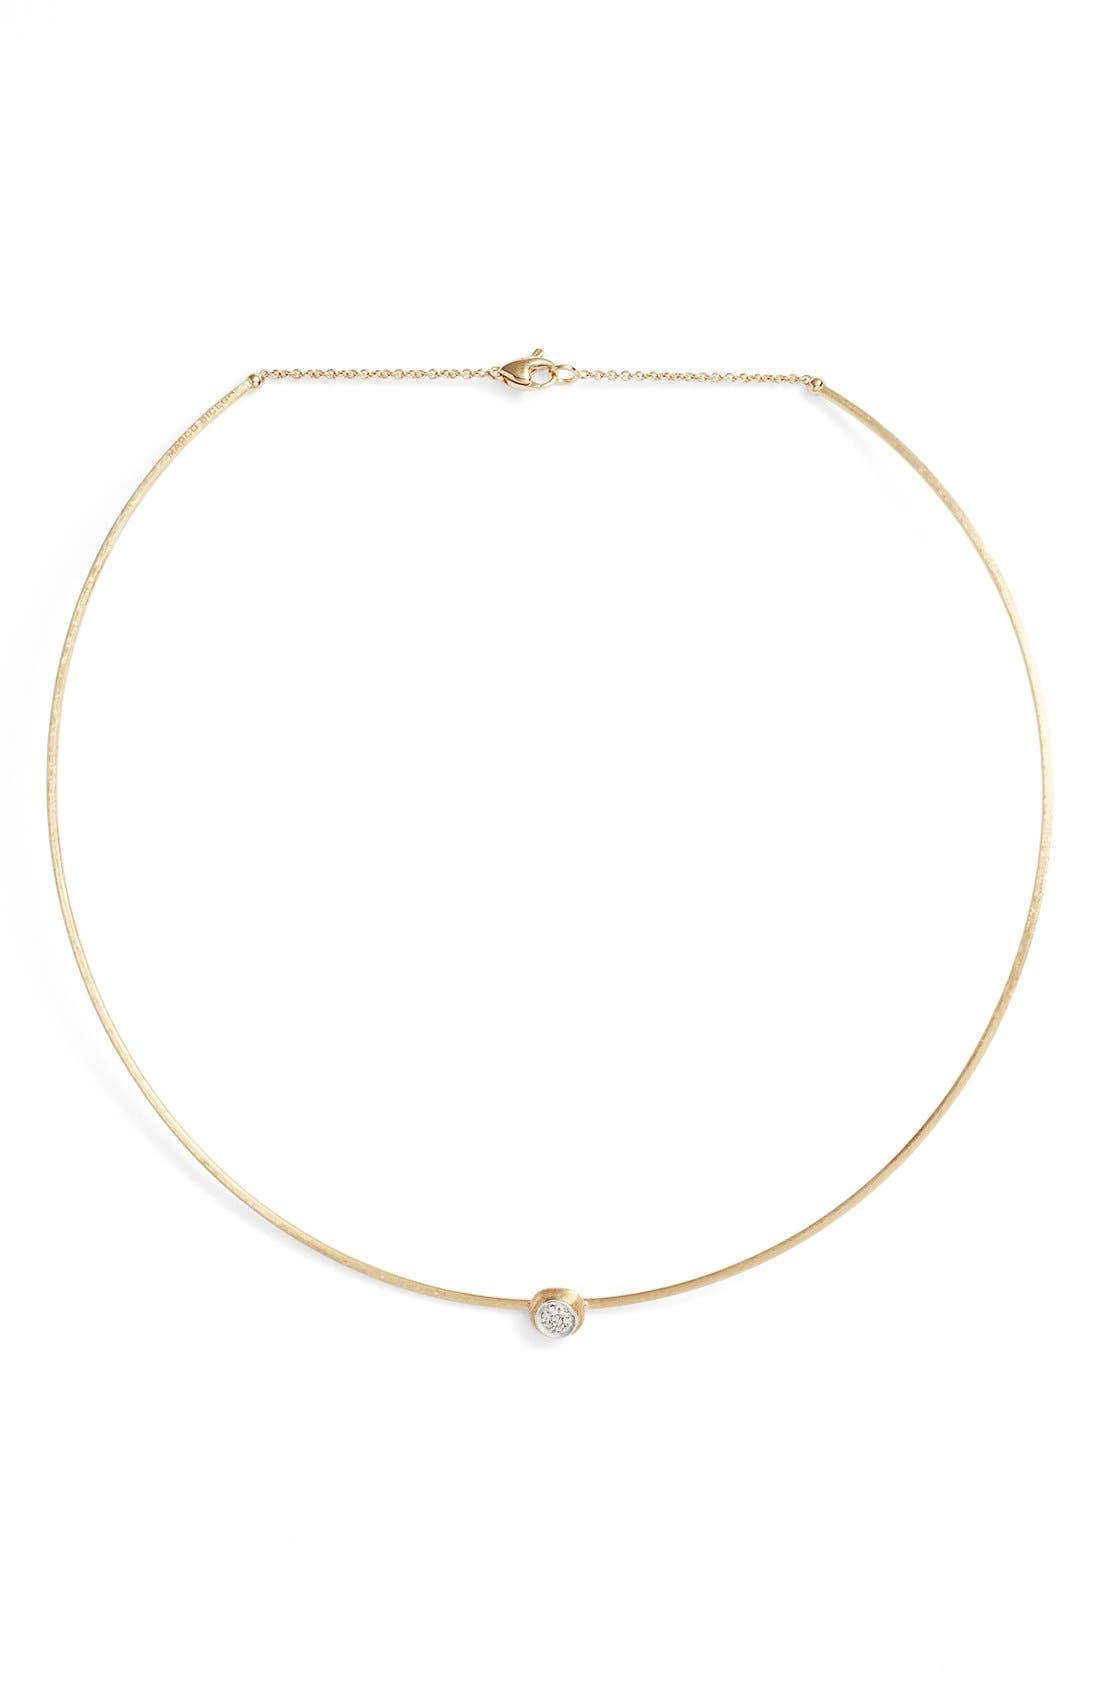 Main Image - Marco Bicego Diamond Collar Necklace